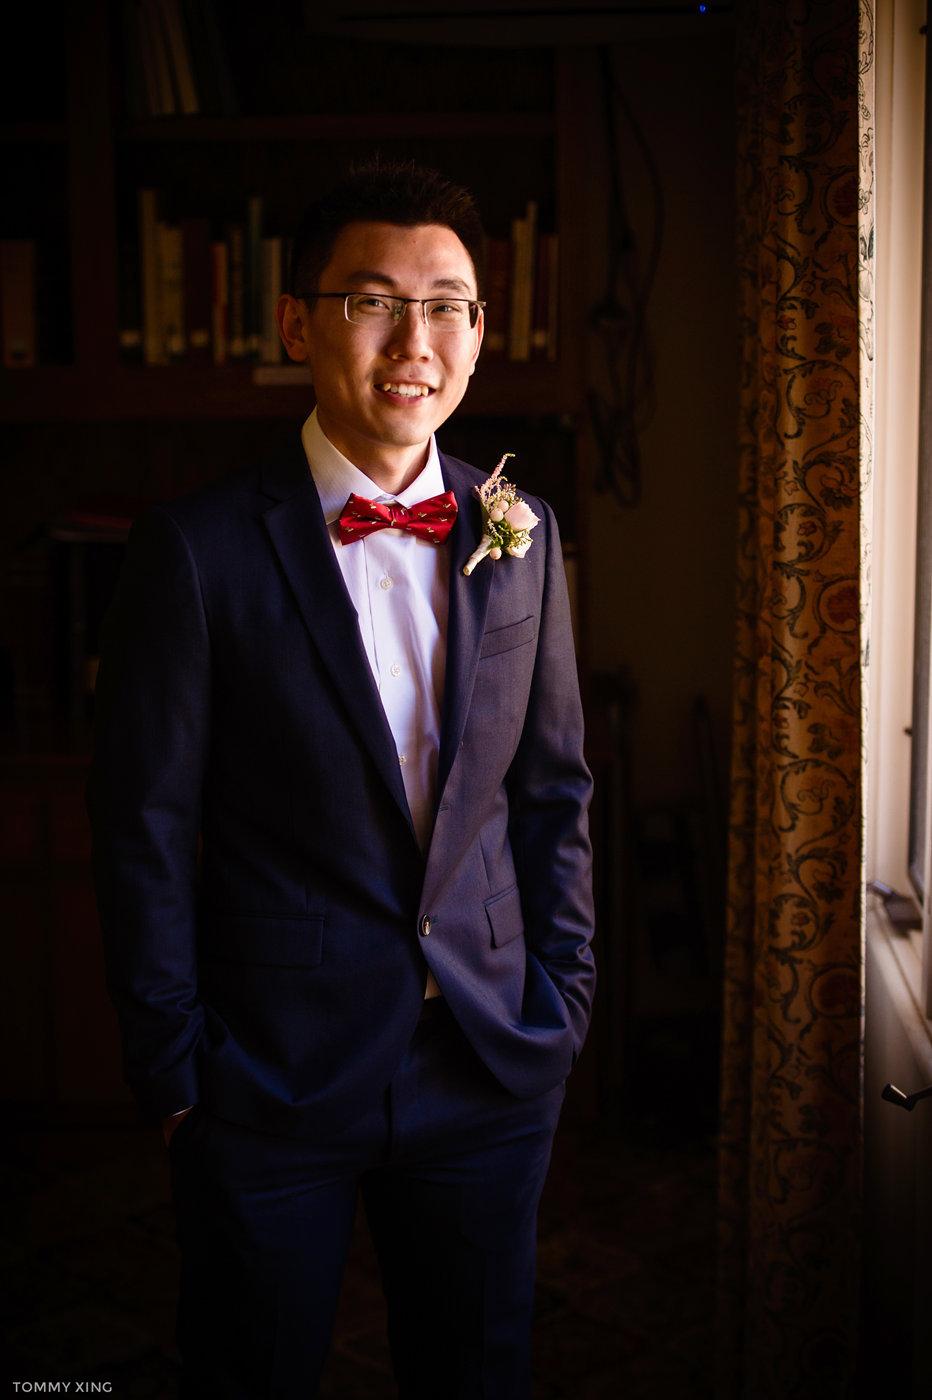 Neighborhood Church Wedding Ranho Palos Verdes Los Angeles Tommy Xing Photography 洛杉矶旧金山婚礼婚纱照摄影师 015.jpg